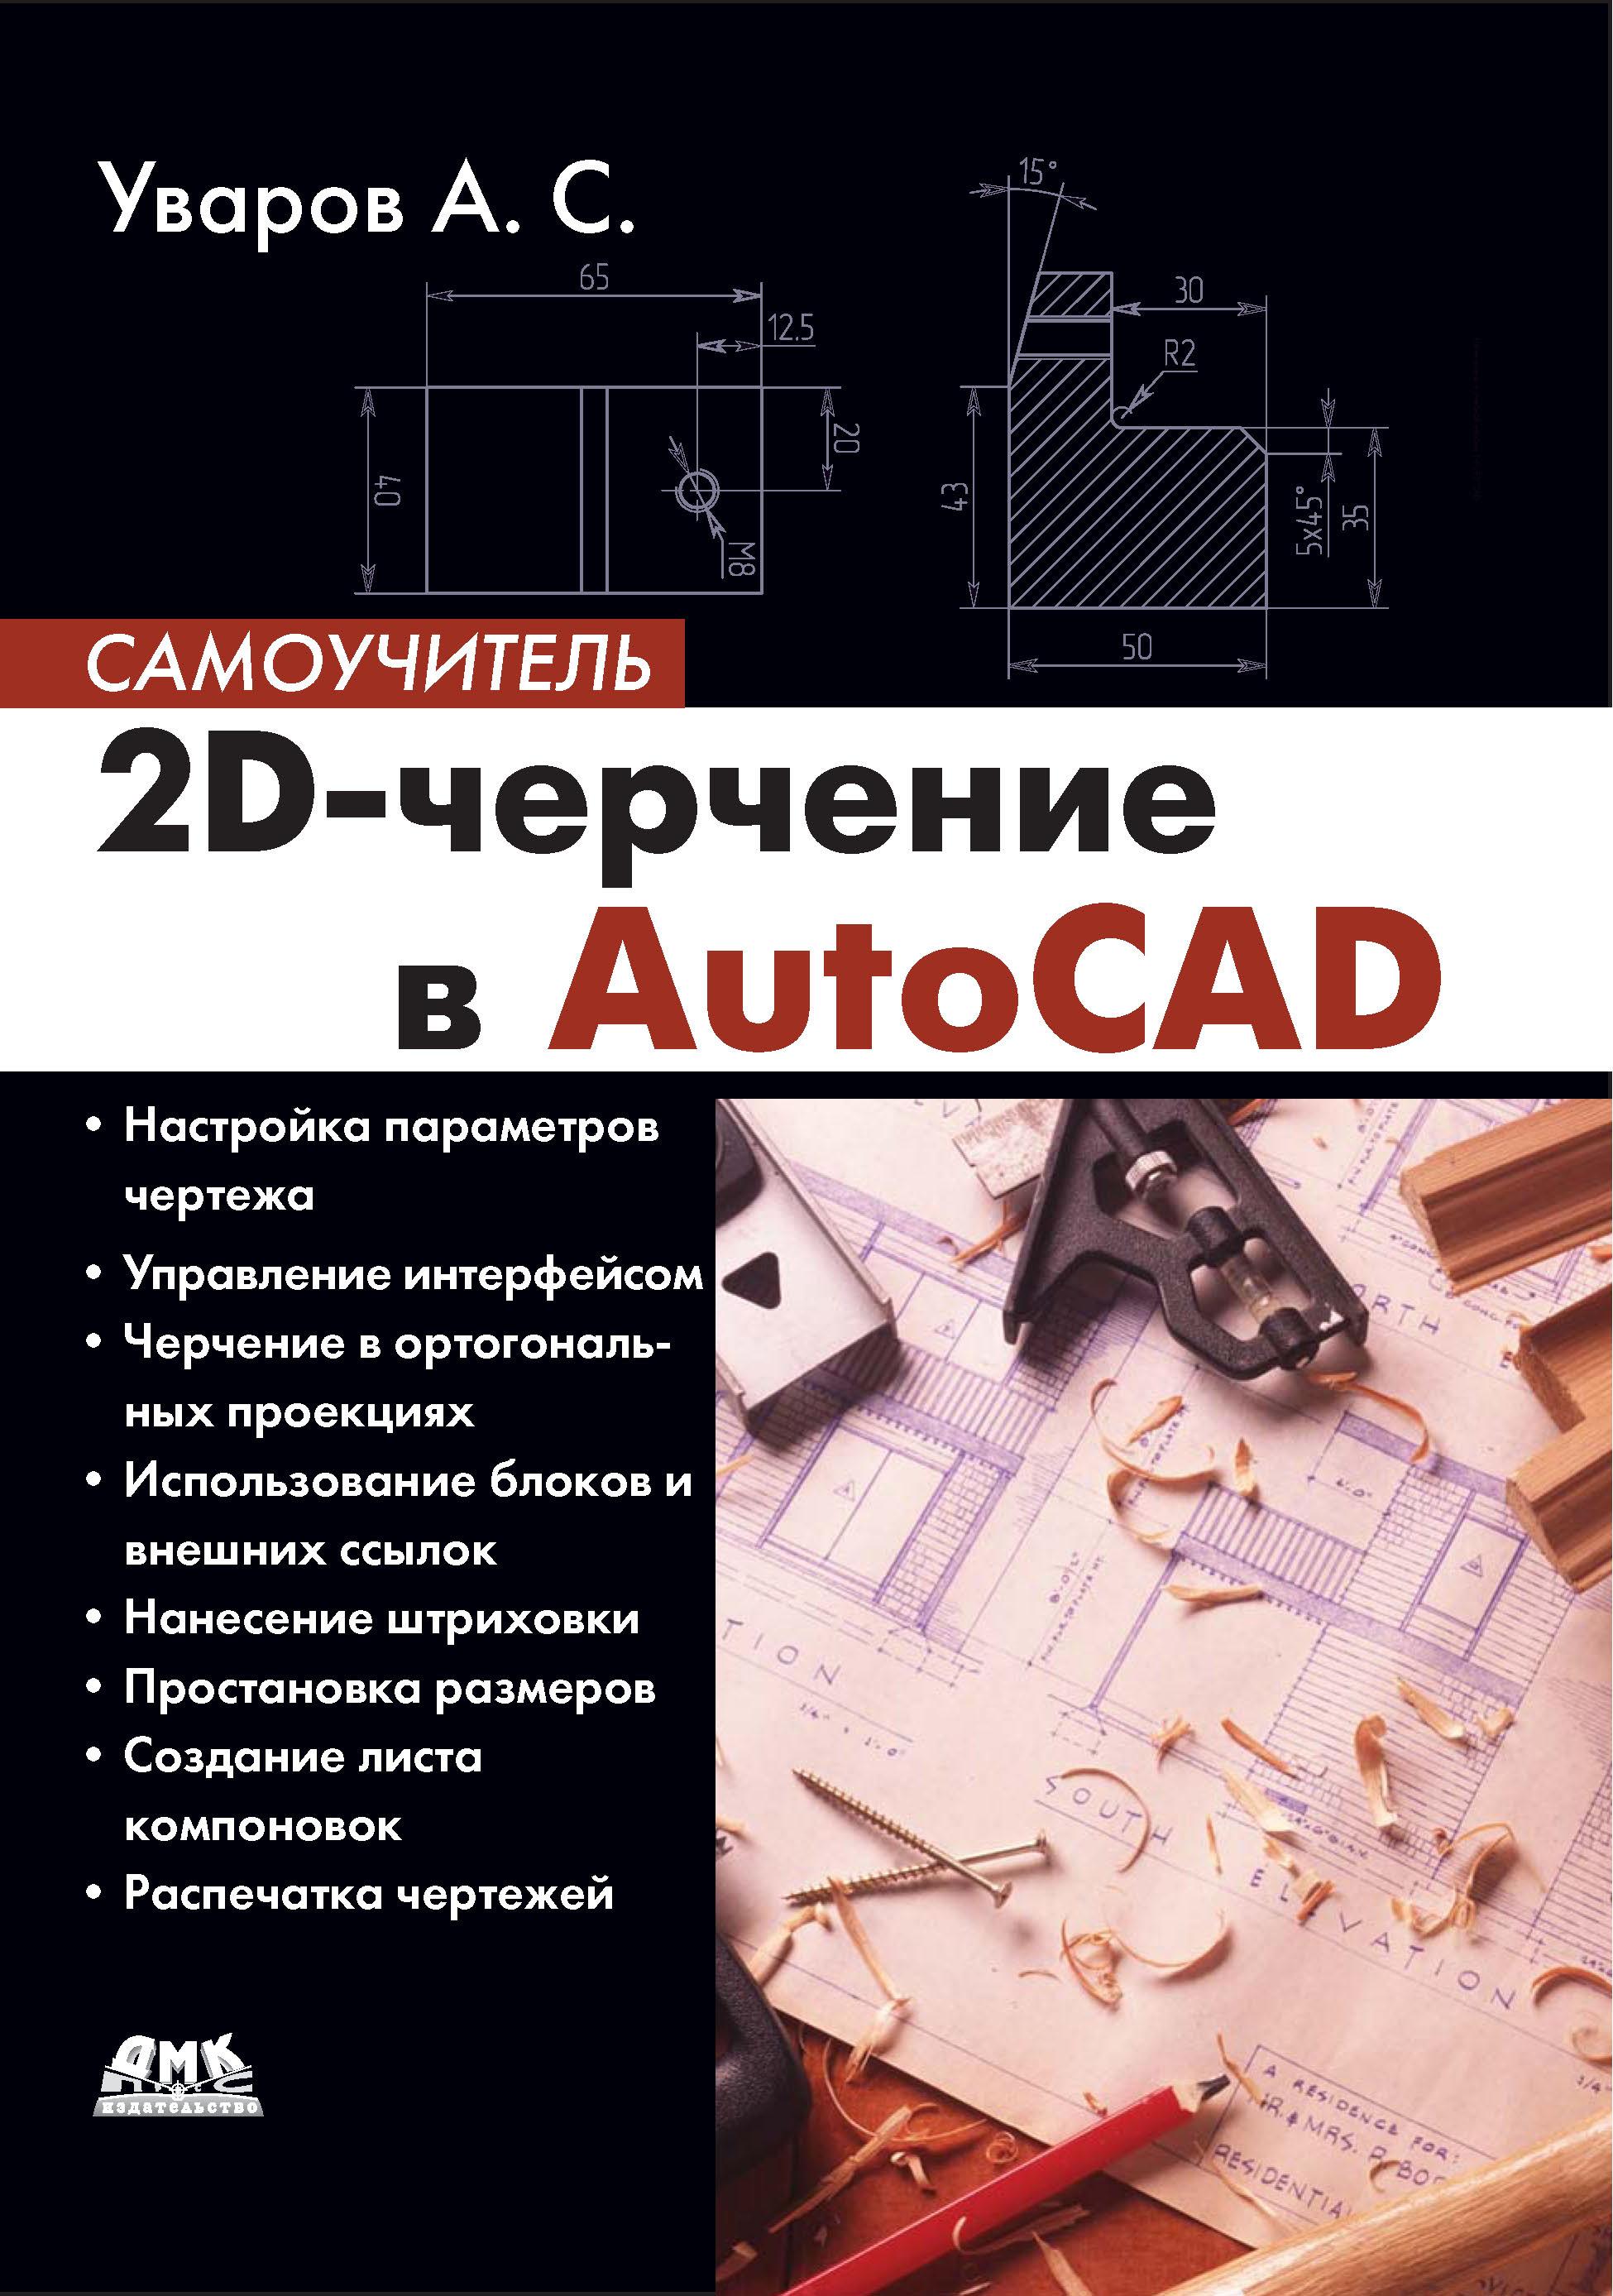 2D-черчение в AutoCAD